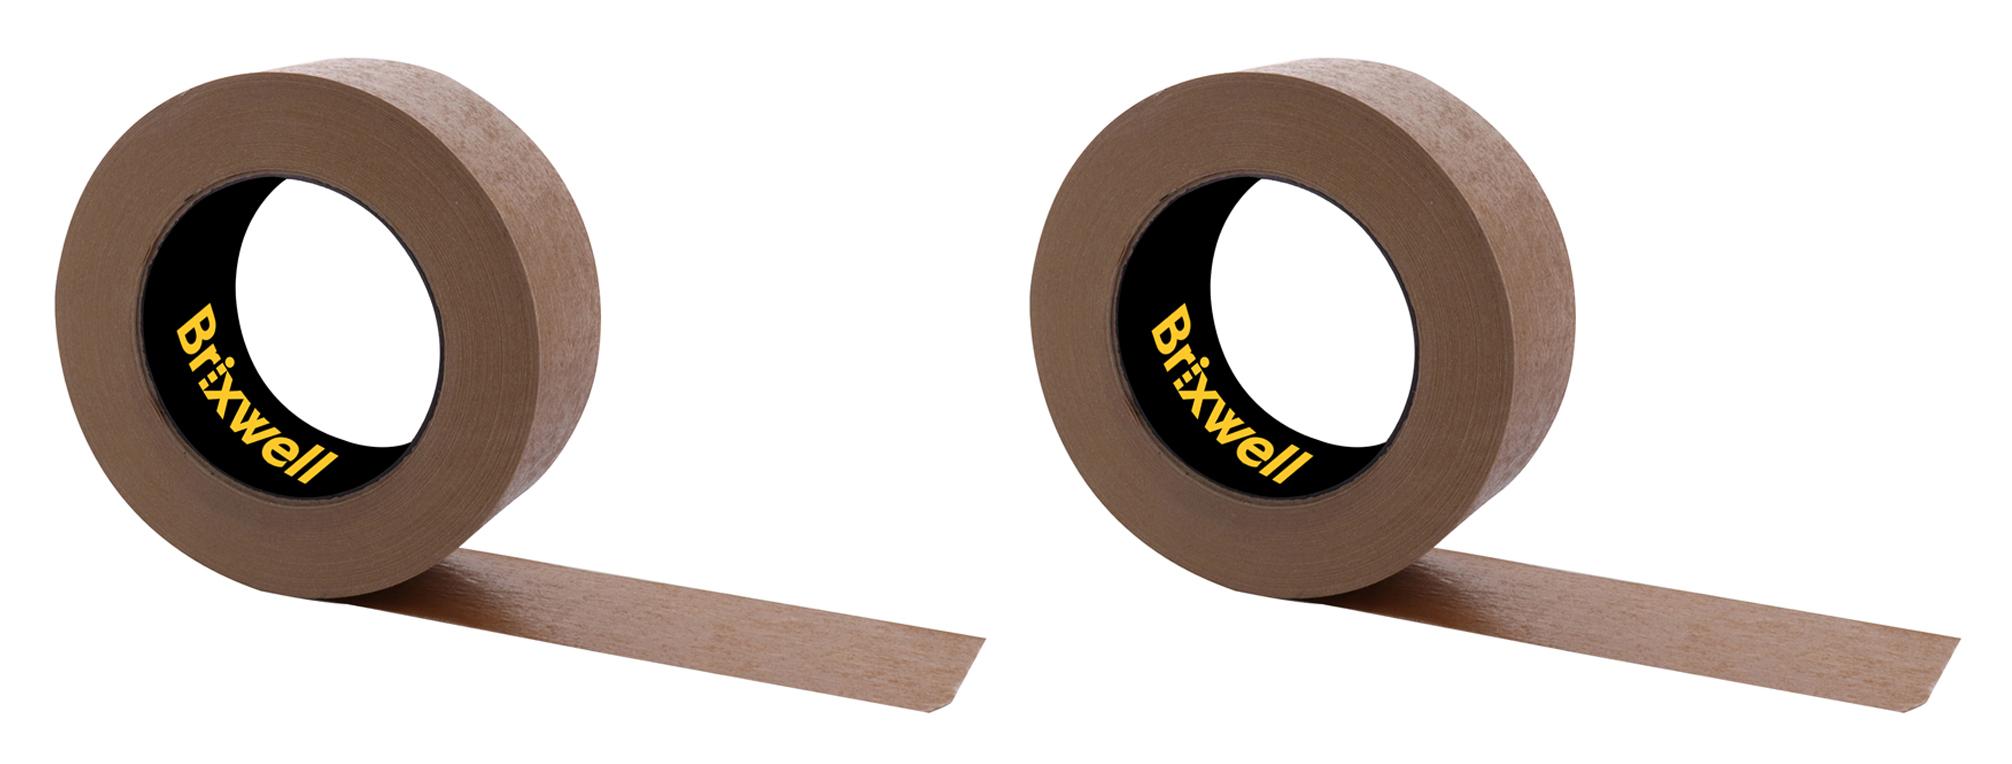 Flatback Kraft Brown Paper Packing Tape 2 Inch x 60 Yards 5.5 Mil 24 Rolls